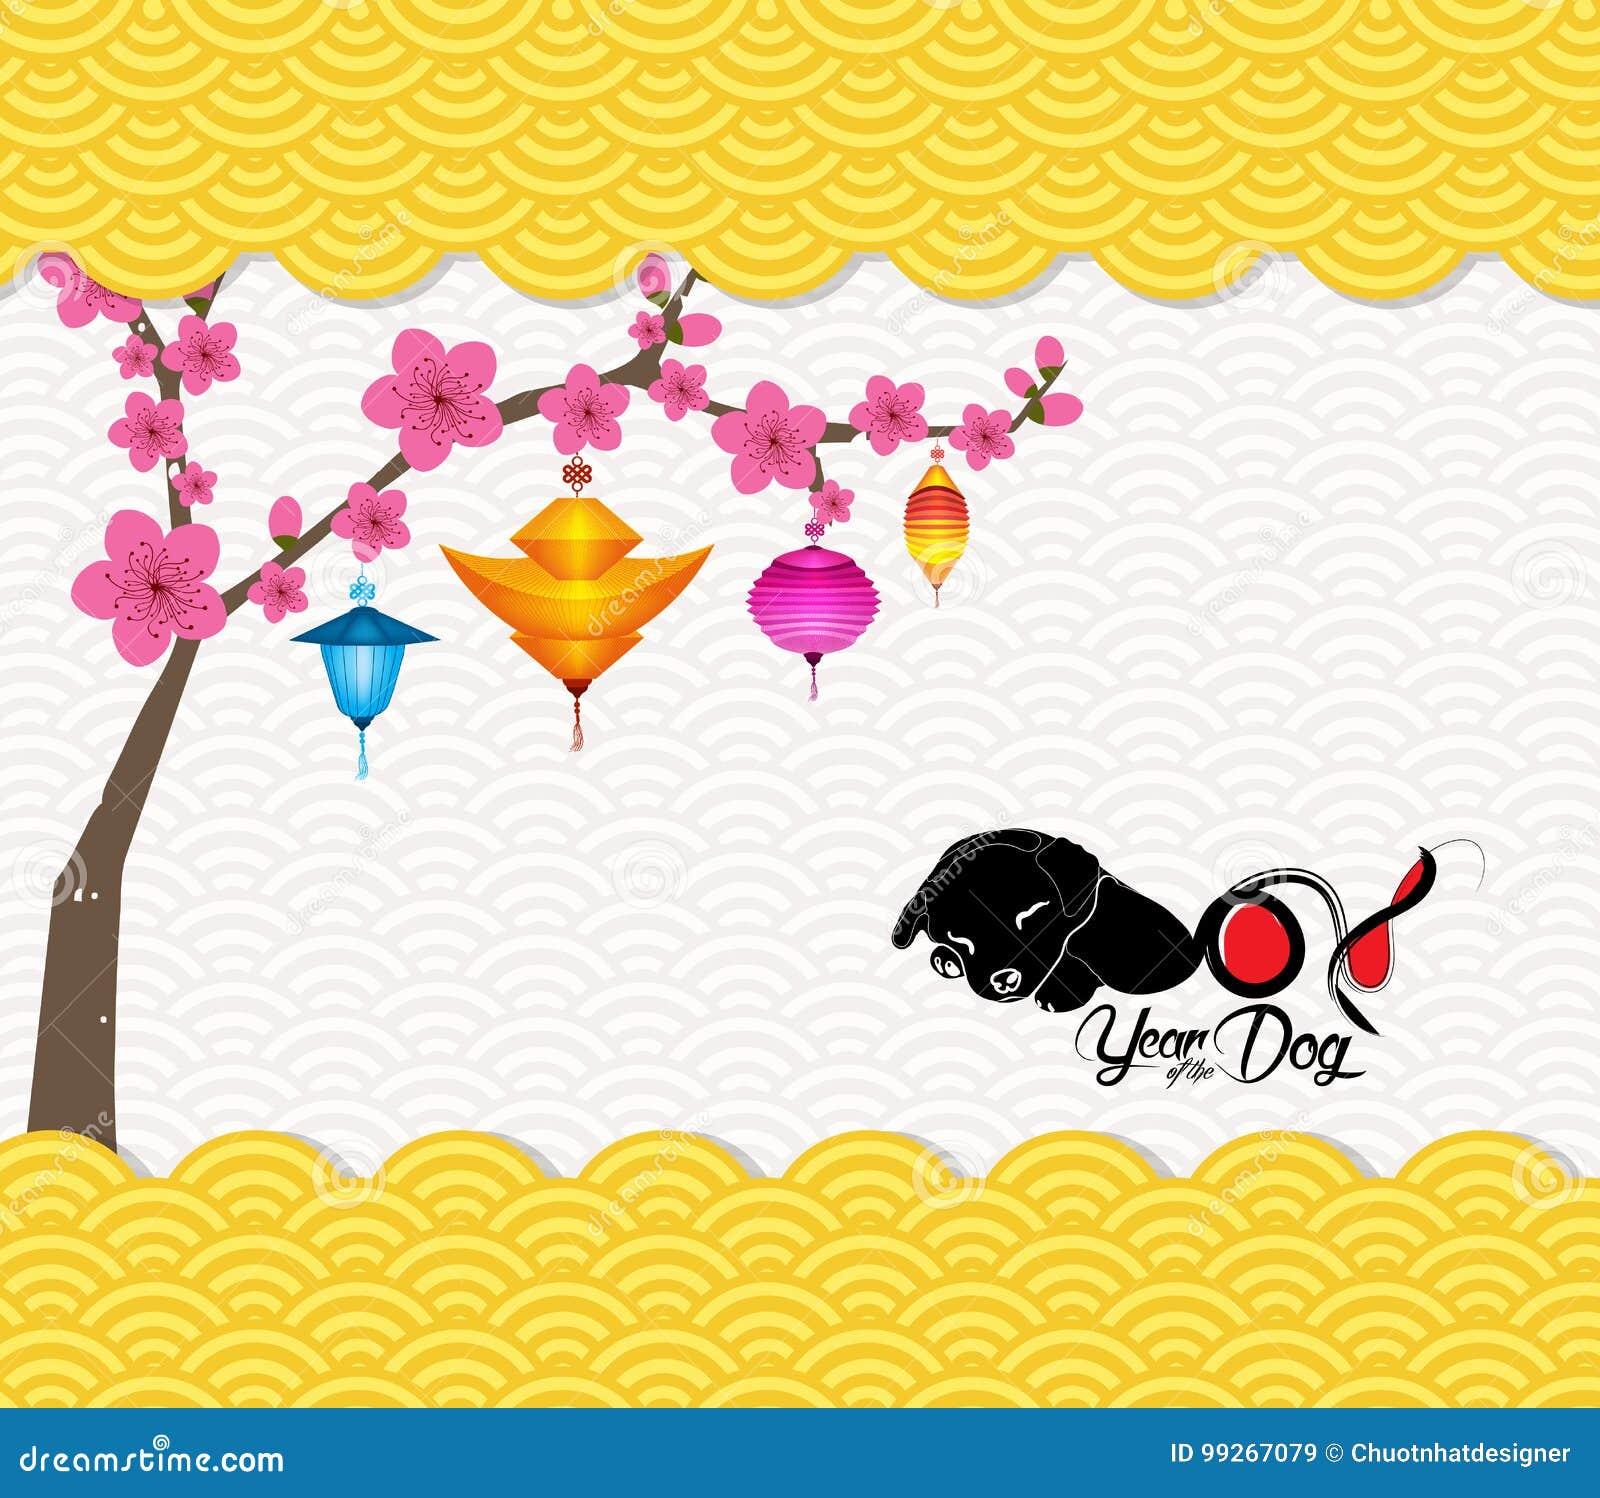 chinese new year 2018 lantern pattern background year of the dog